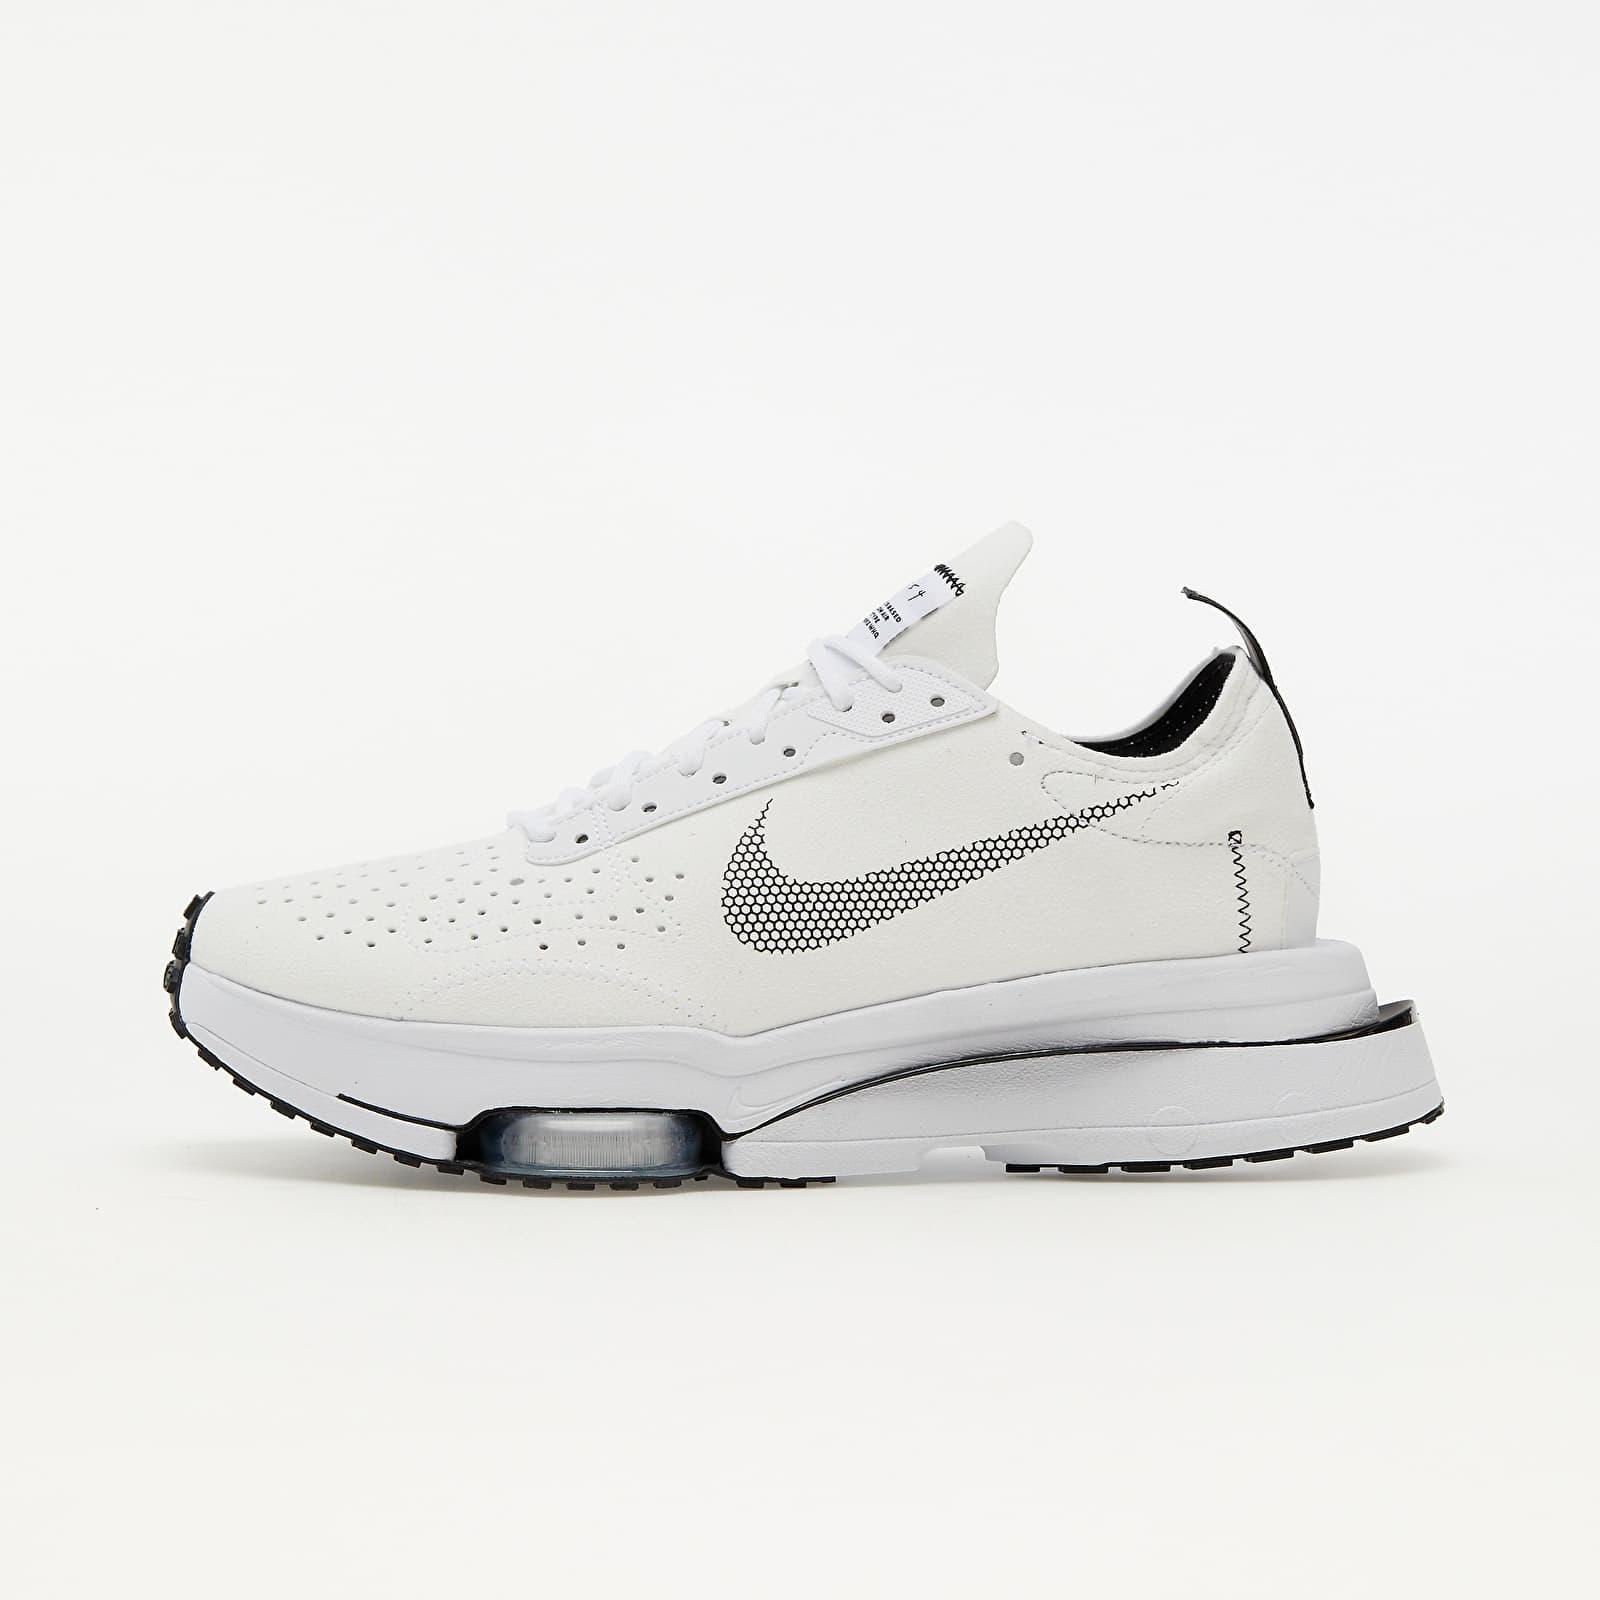 Nike Air Zoom-Type White/ Black/ White | Footshop